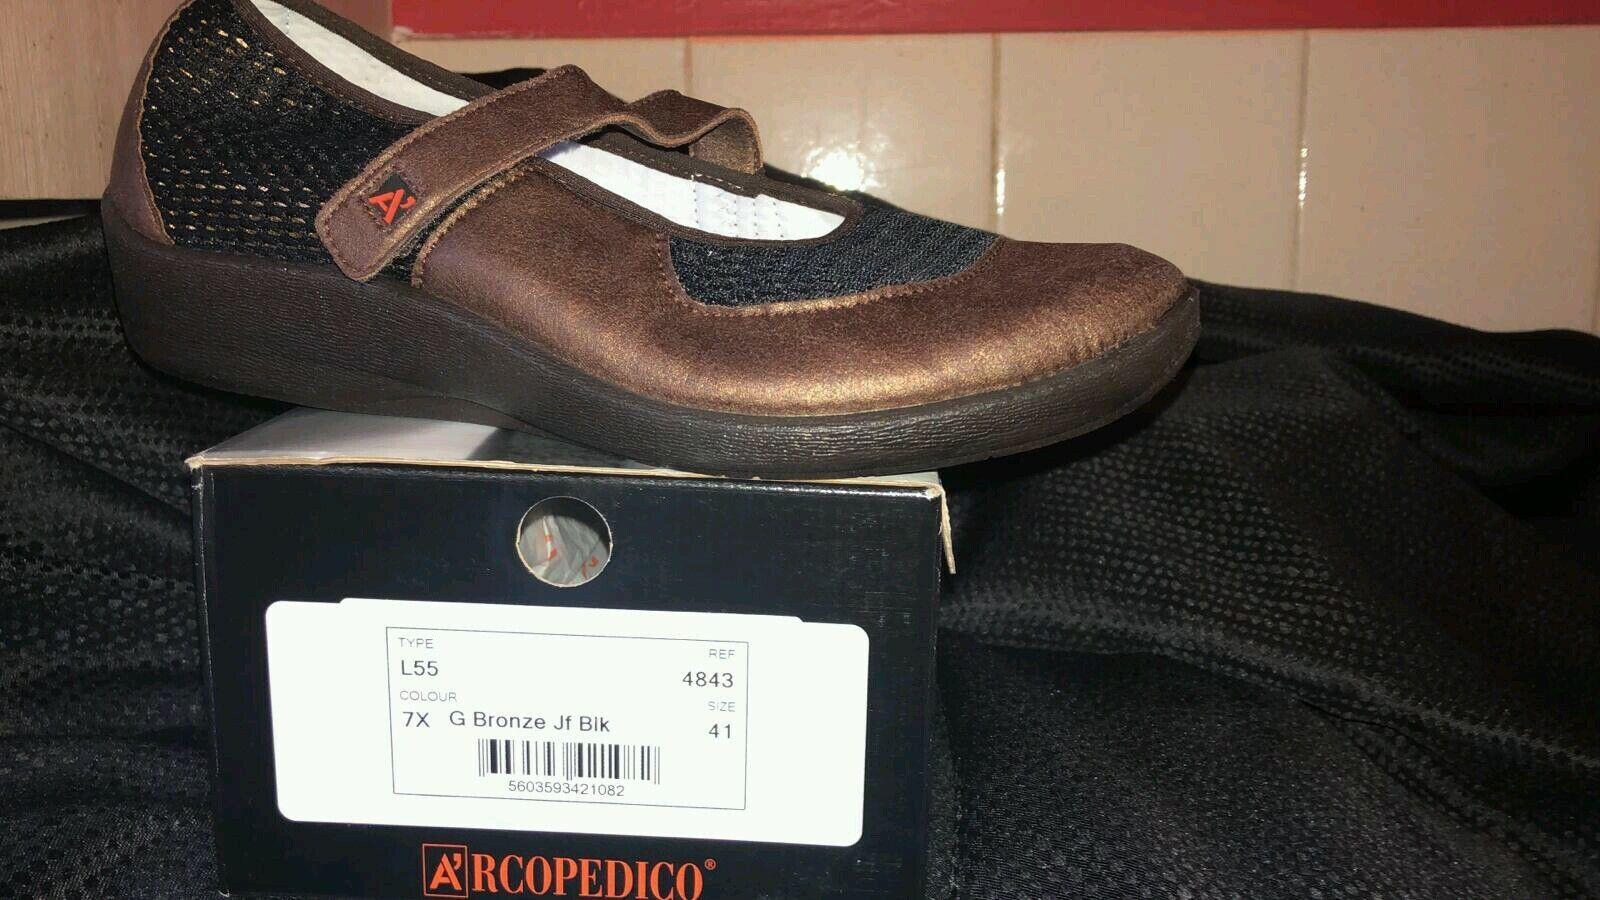 Arcopedico Comfort Orthopaedic shoes - L55 model in bronze - Various sizes - NEW